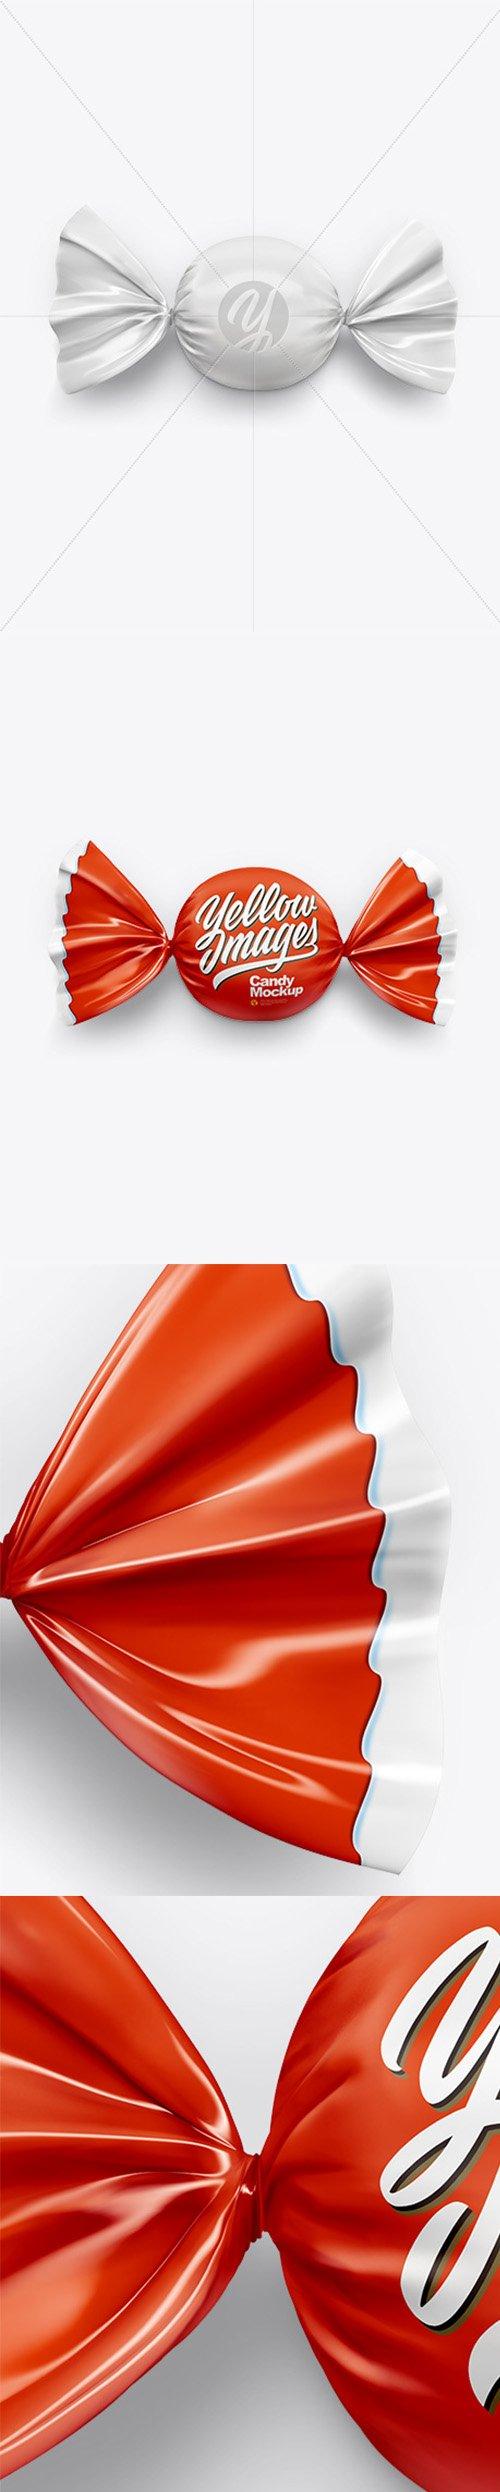 Candy Mockup - Top View 43968 TIF